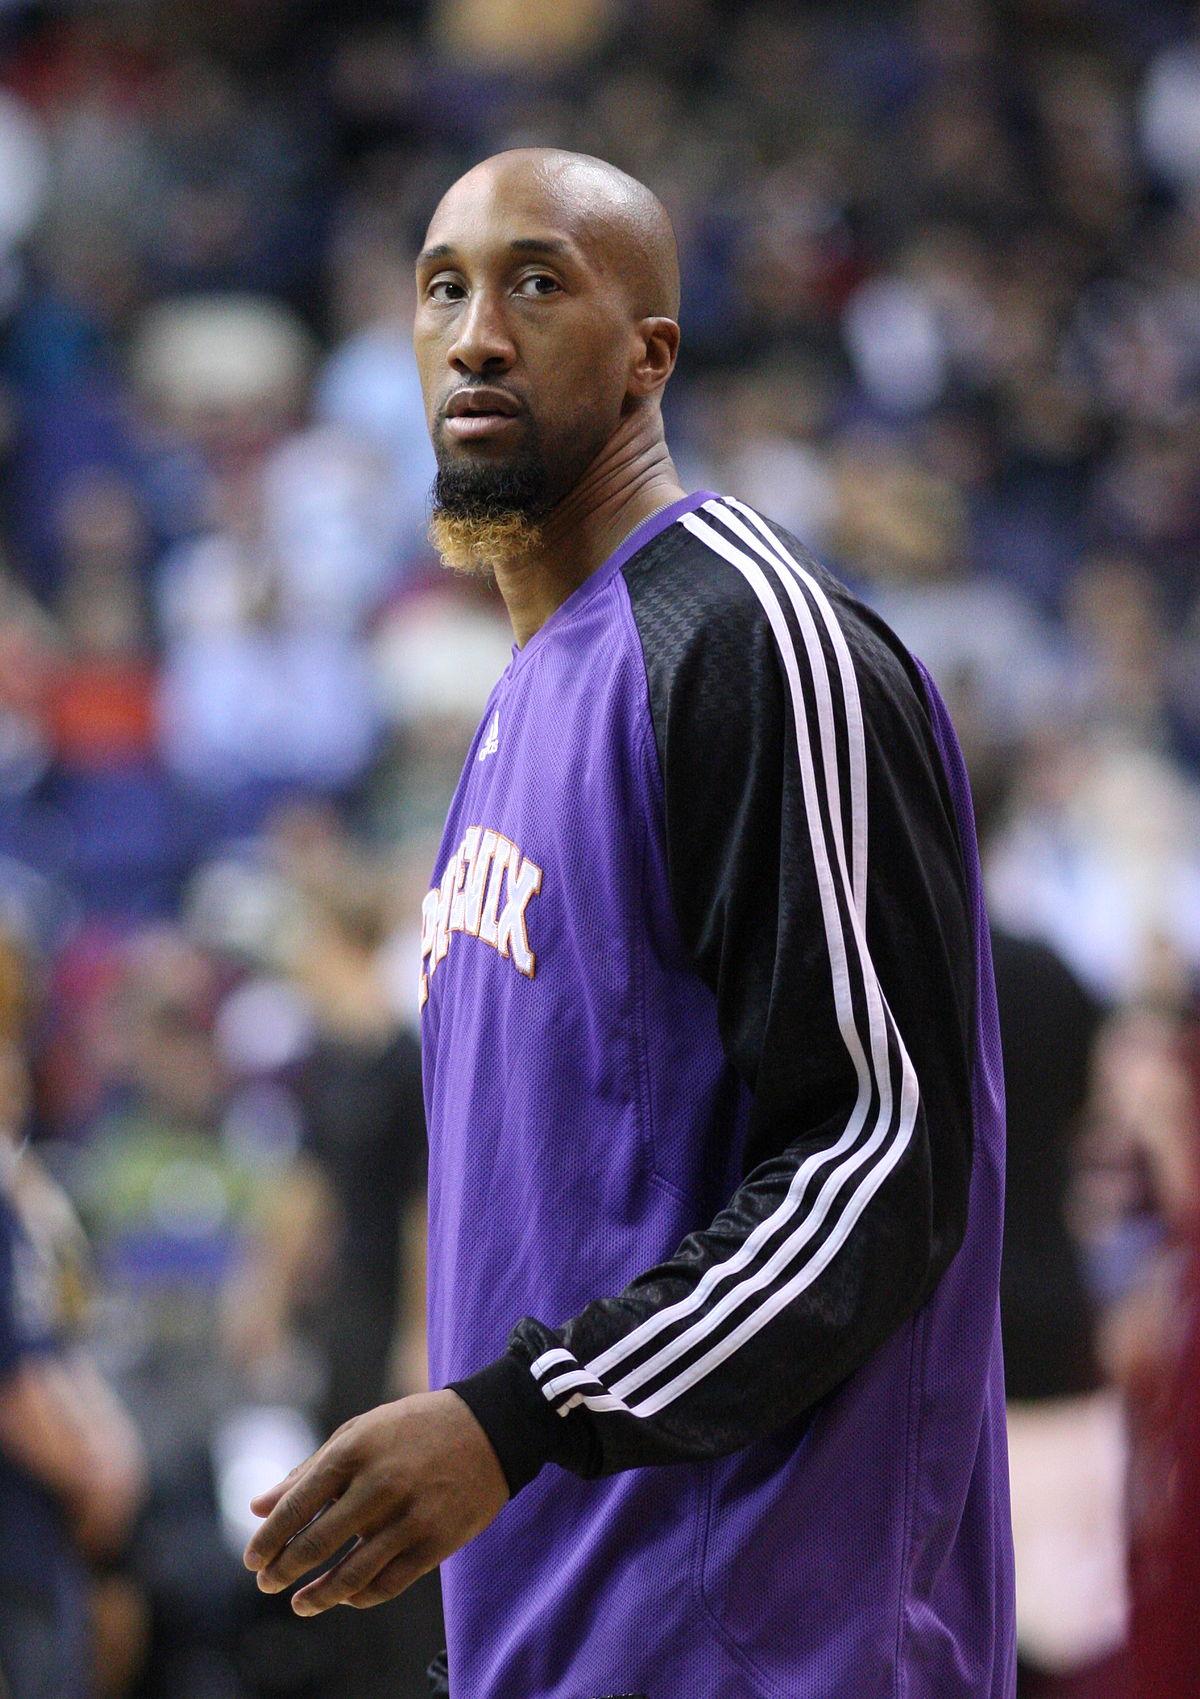 Cleveland Basketball Team >> Brian Skinner - Wikipedia